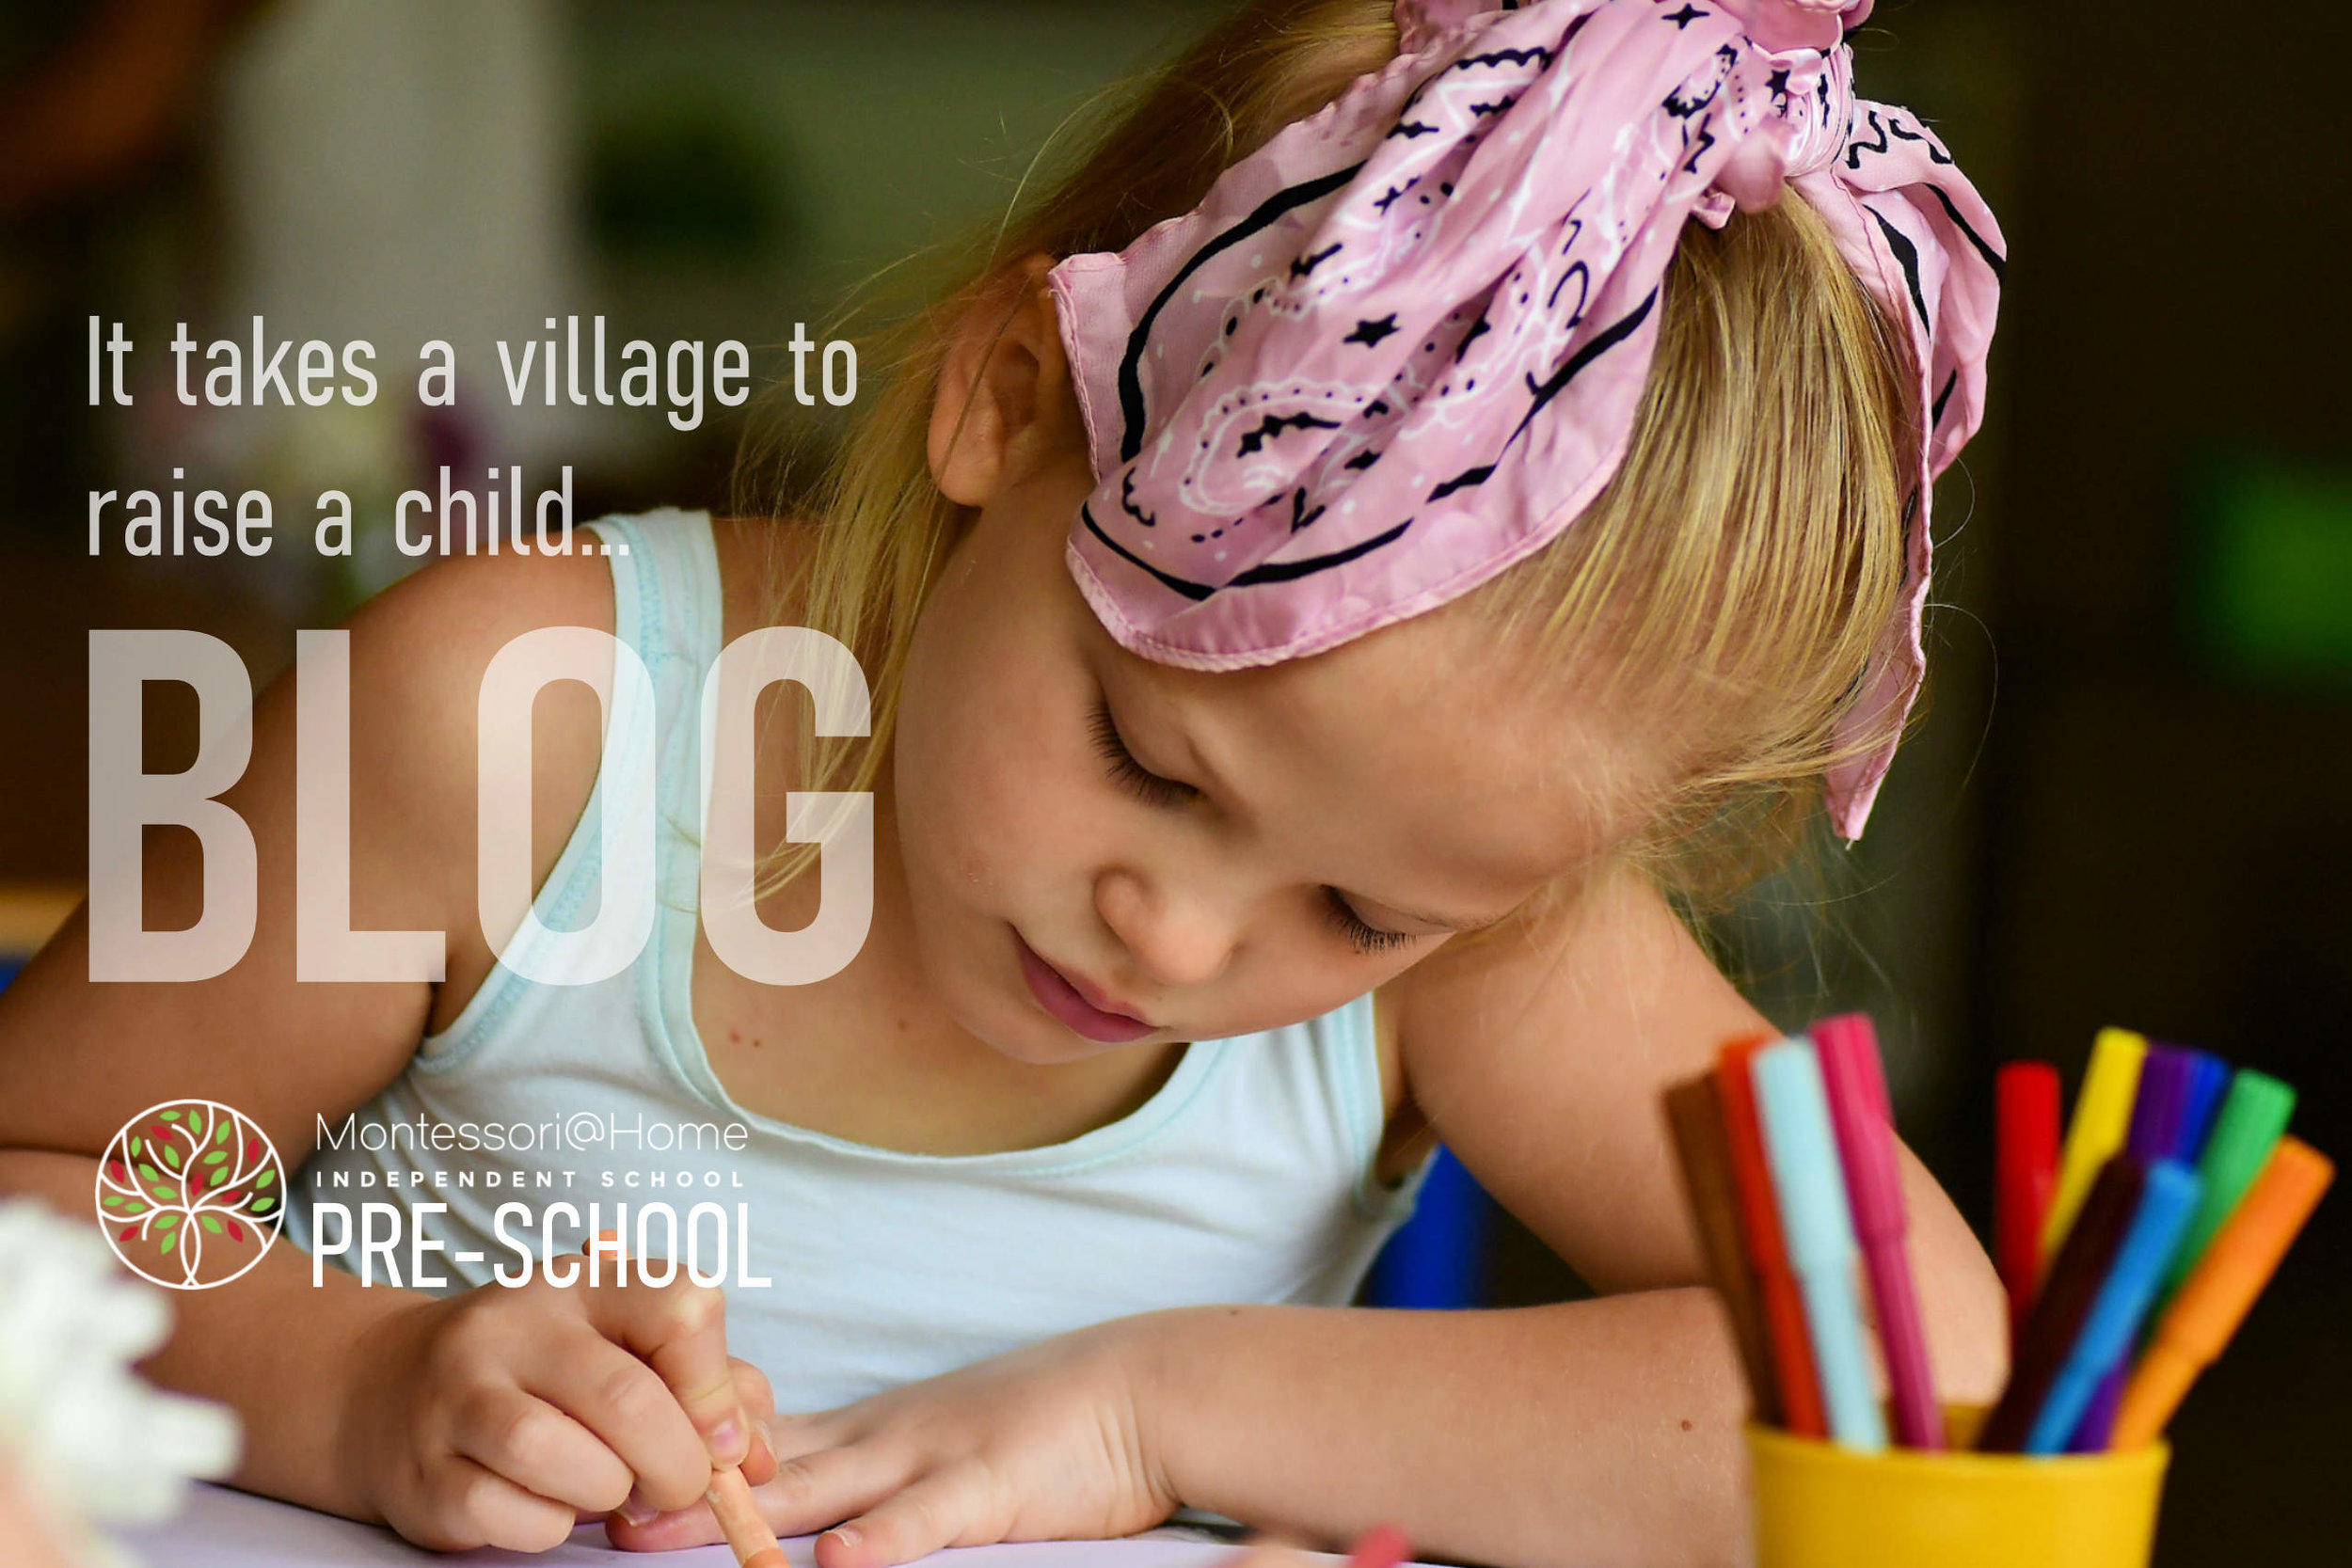 _DSC4710 Montessori at home marketing preschool programblog thumbnail.jpg